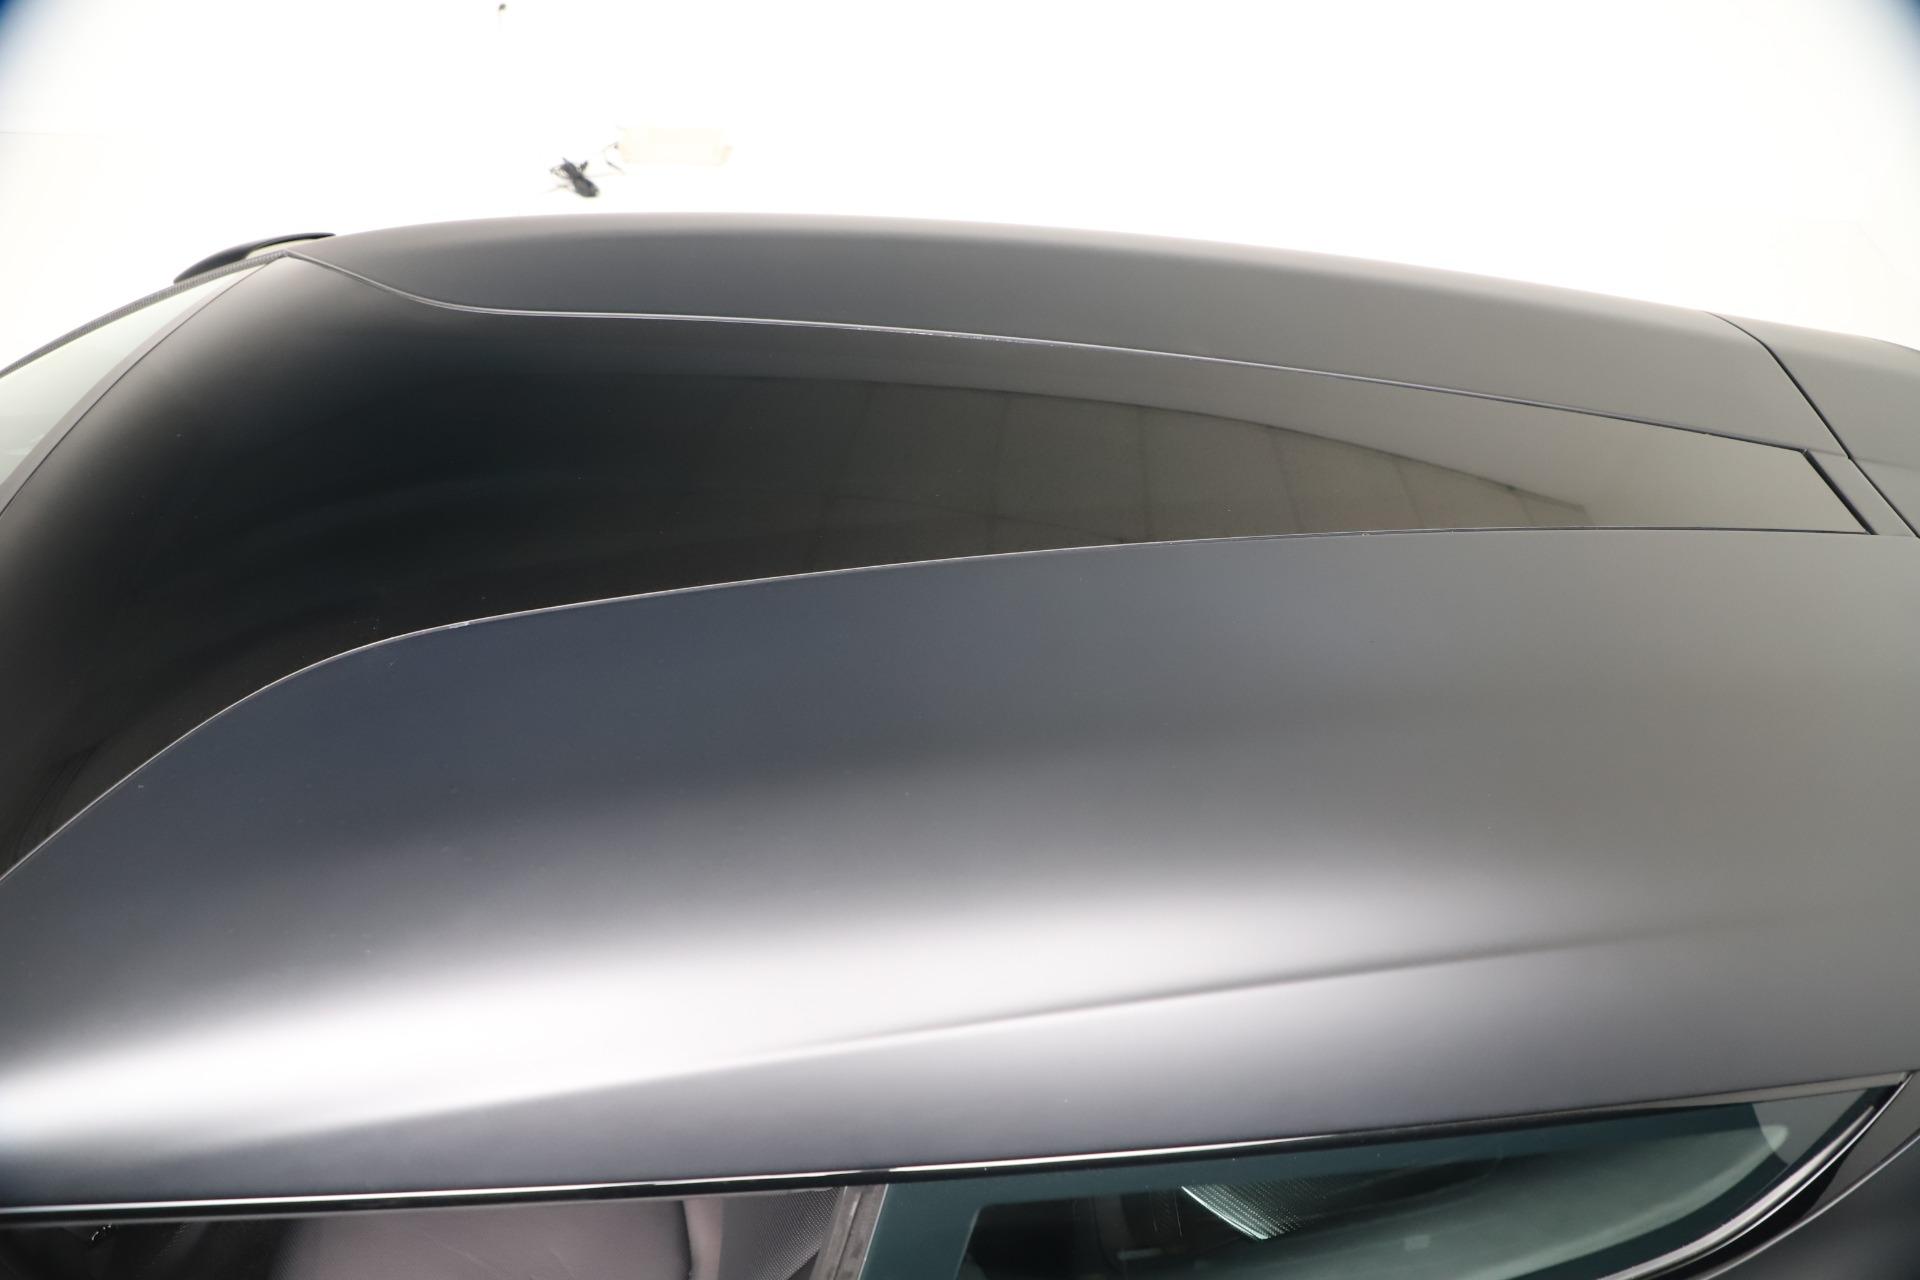 New 2019 Aston Martin Vanquish Shooting Brake For Sale In Westport, CT 3512_p27